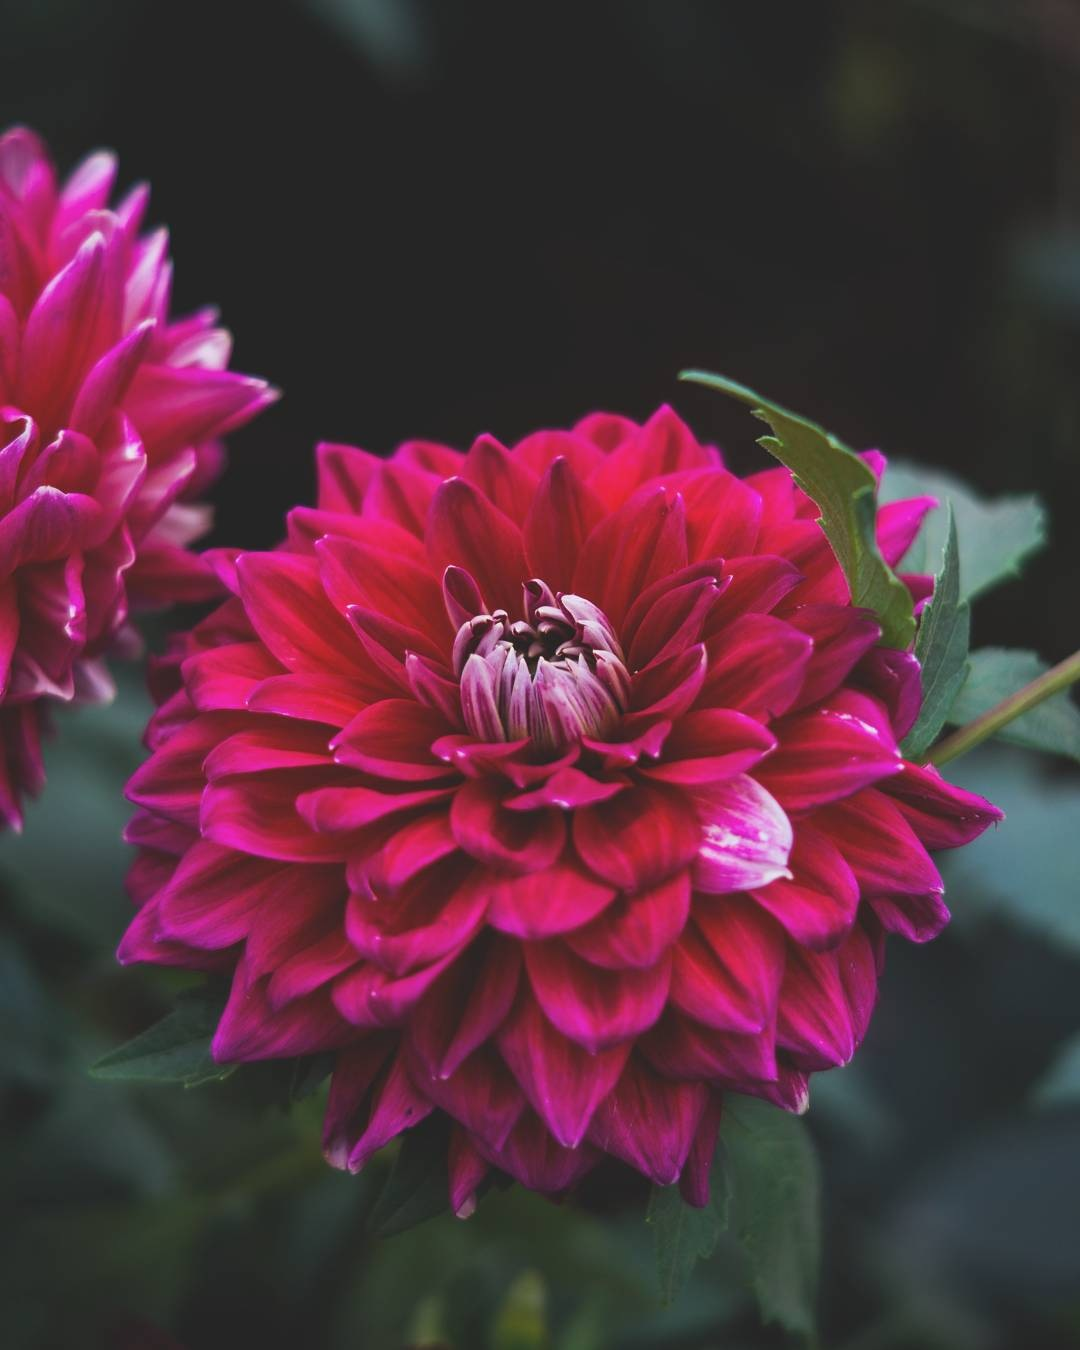 flowers by Nagarjun Mallesh